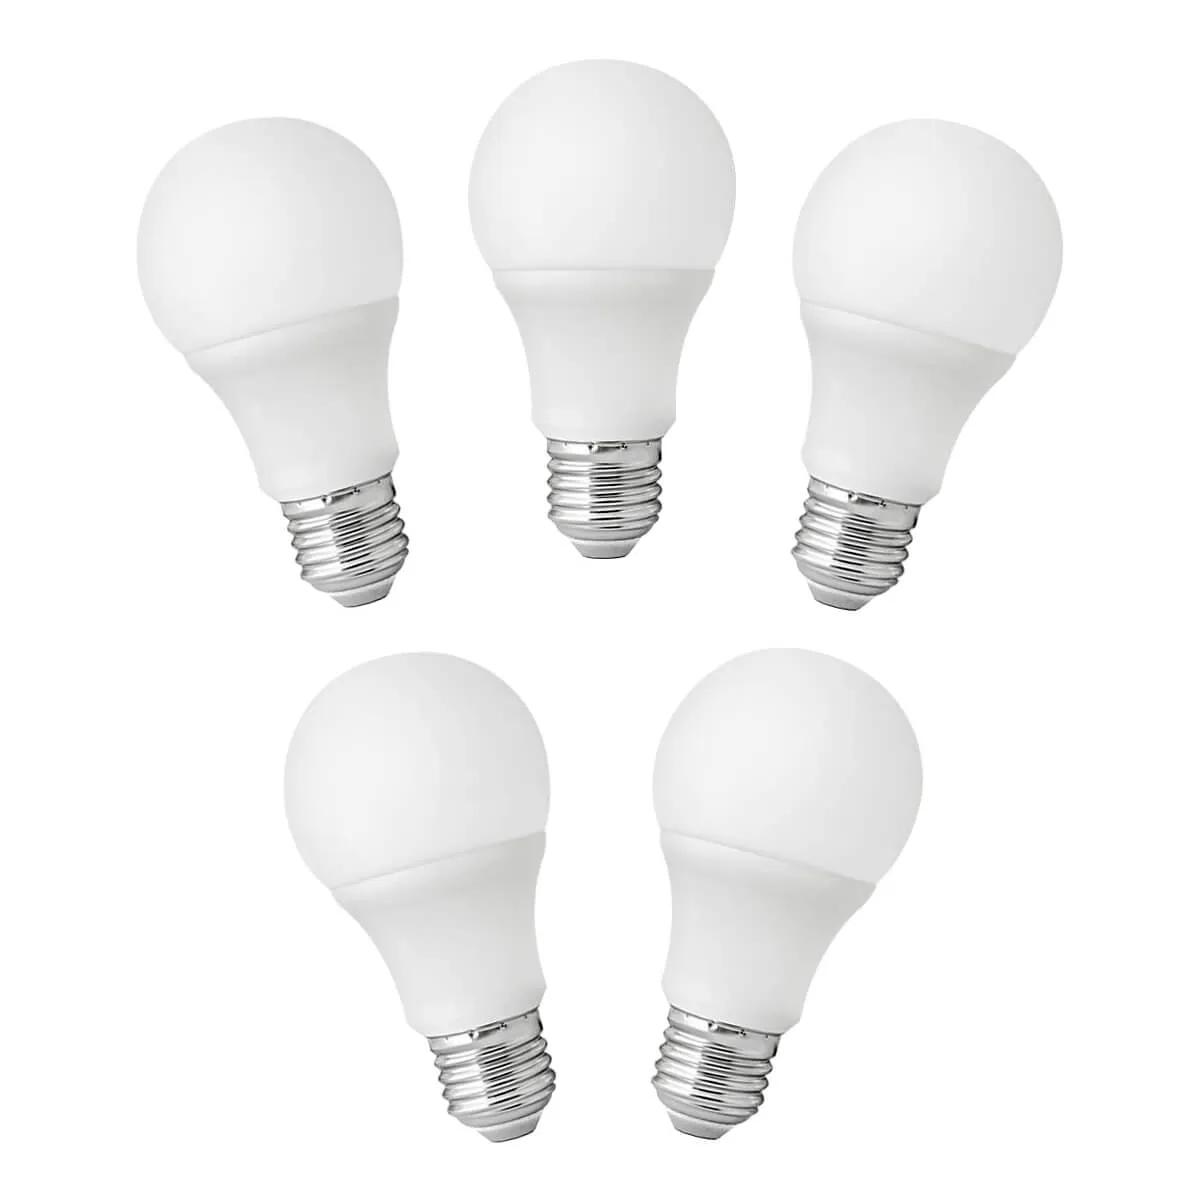 Kit 5 Lâmpadas 9W LED A60 - Elgin